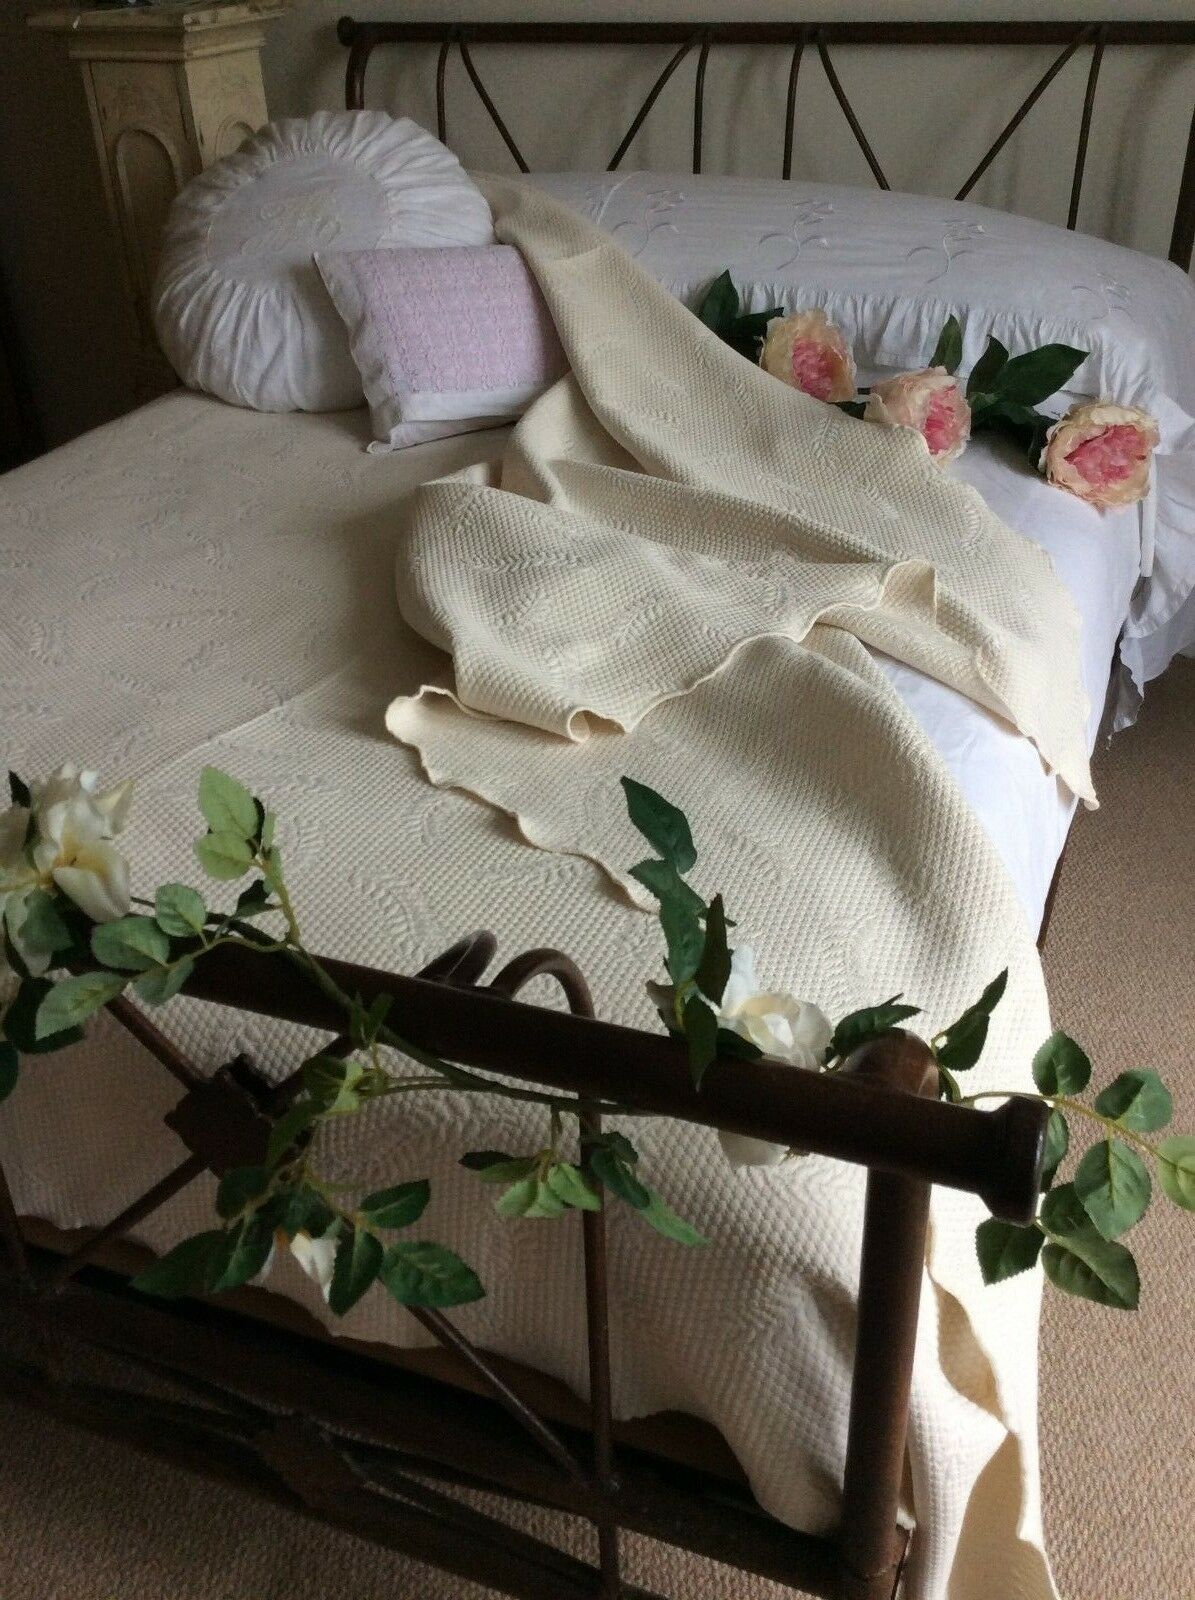 Beautiful HISPANOVA DesignerHuge Db Kg Cotton Bedspread Cover ThrowInterior BN